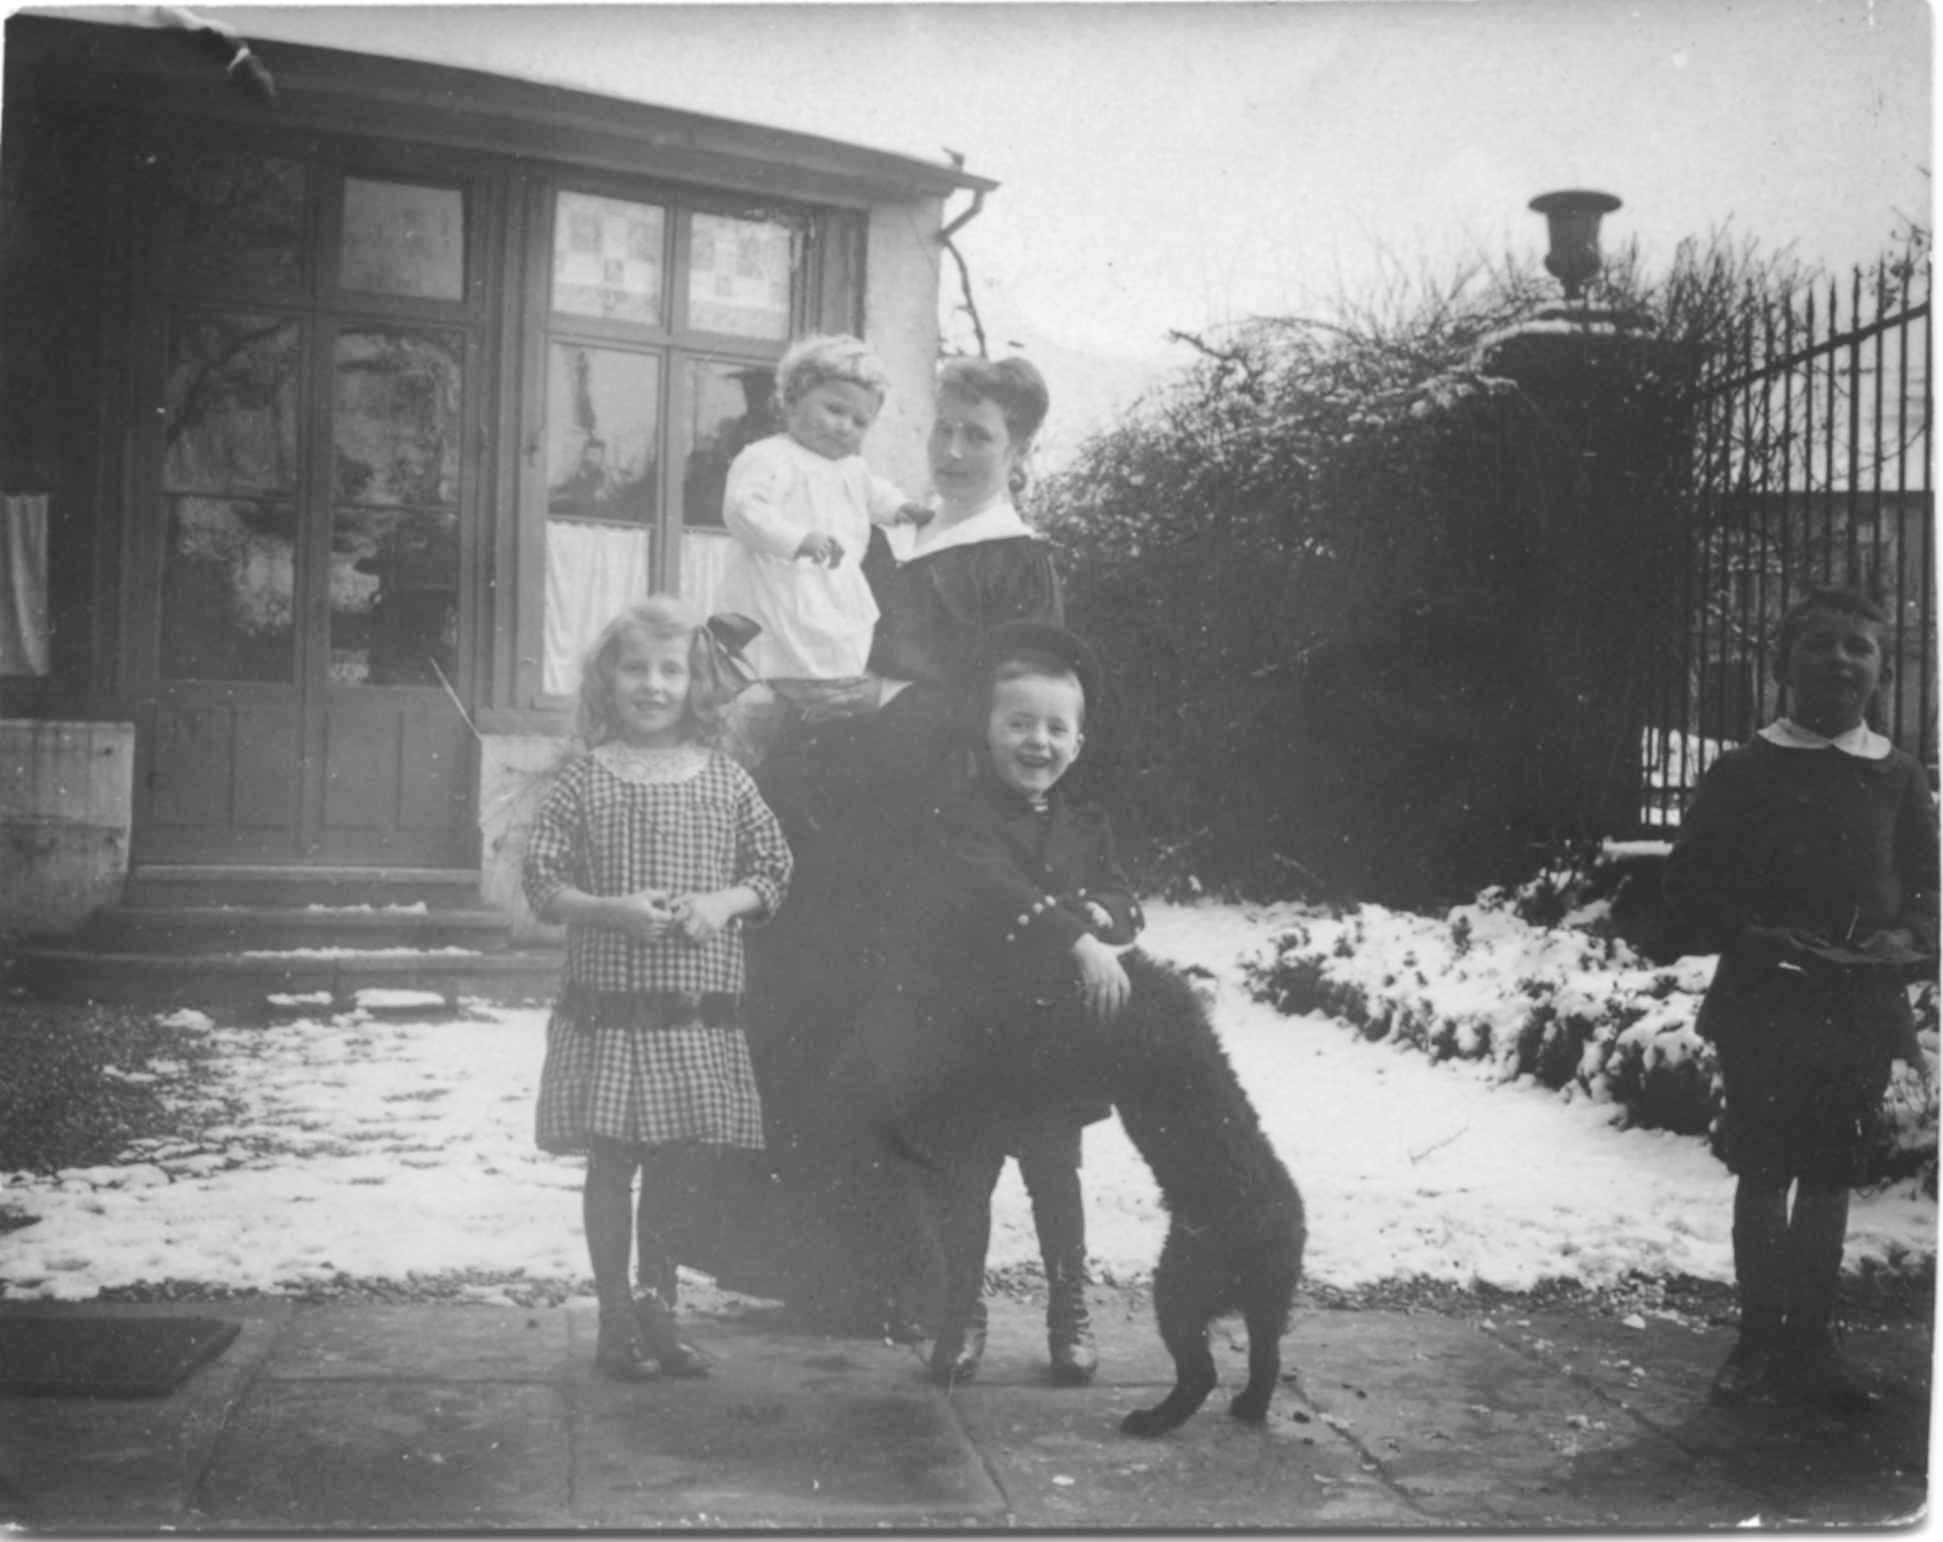 1915-3-Mimi Enfants+Lili N&B-053 Corrigee.jpg